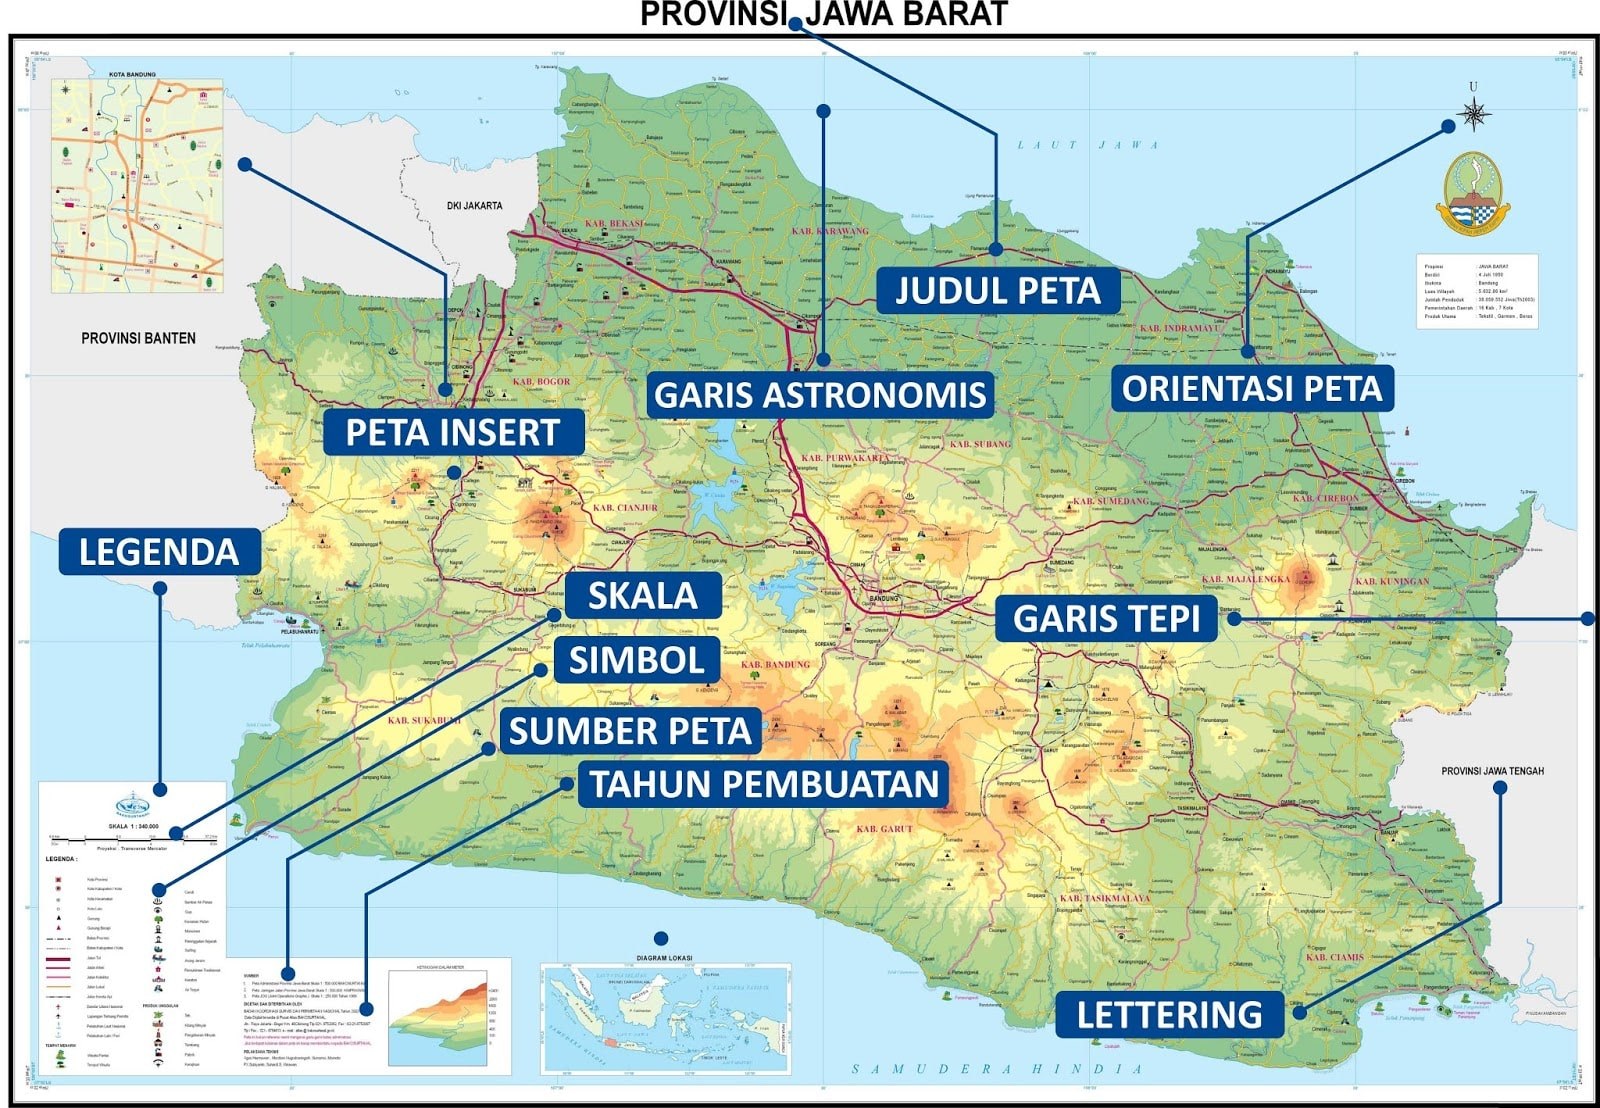 10 Komponen Peta Beserta Penjelasannya